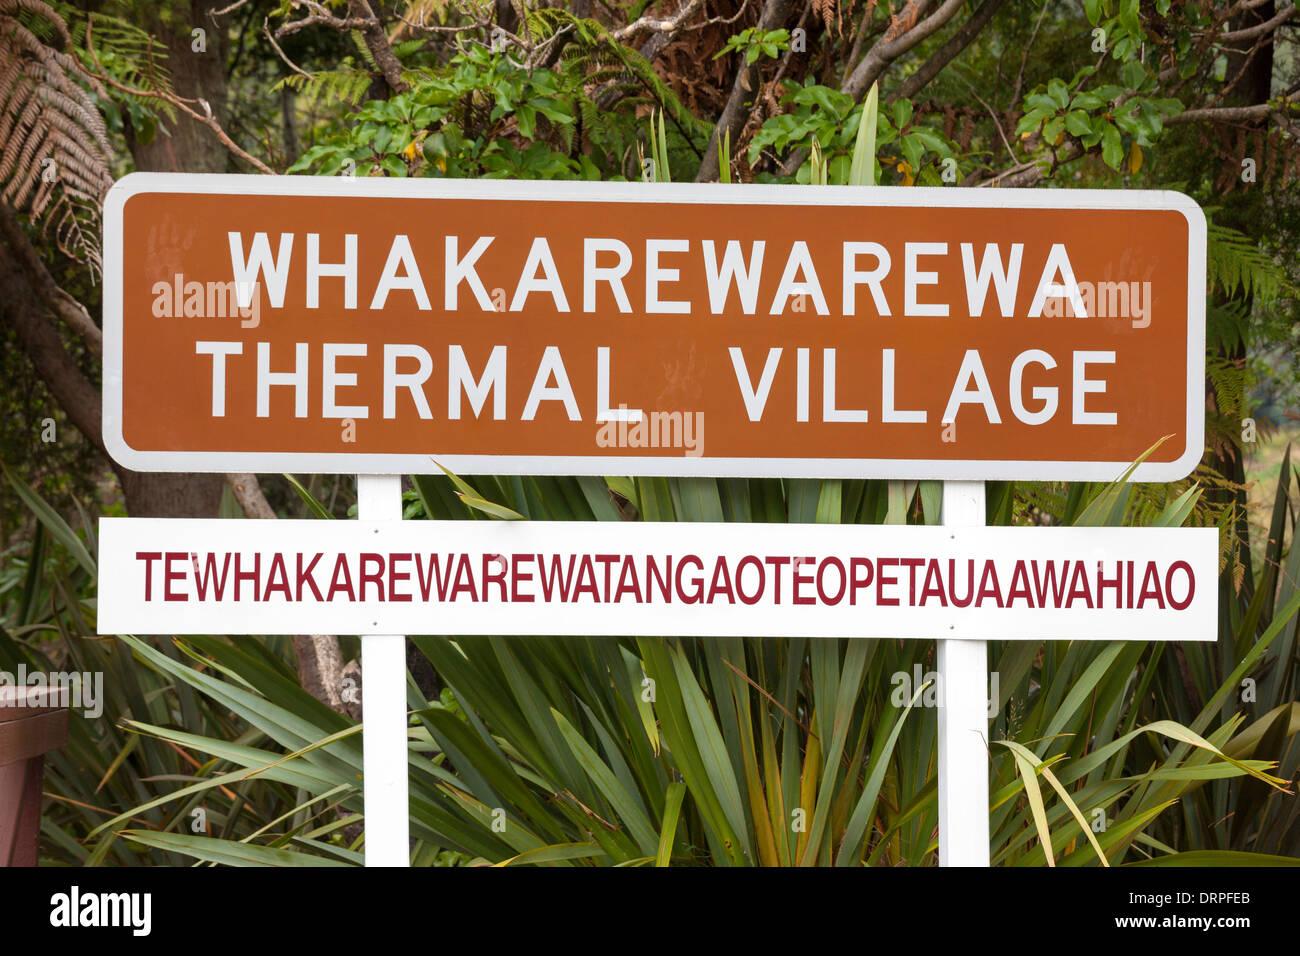 Village Thermal de Whakarewarewa Rotorua signe avec l'original long nom maori sous: Tewhakarewarewatangaoteopetauaawahiao Photo Stock